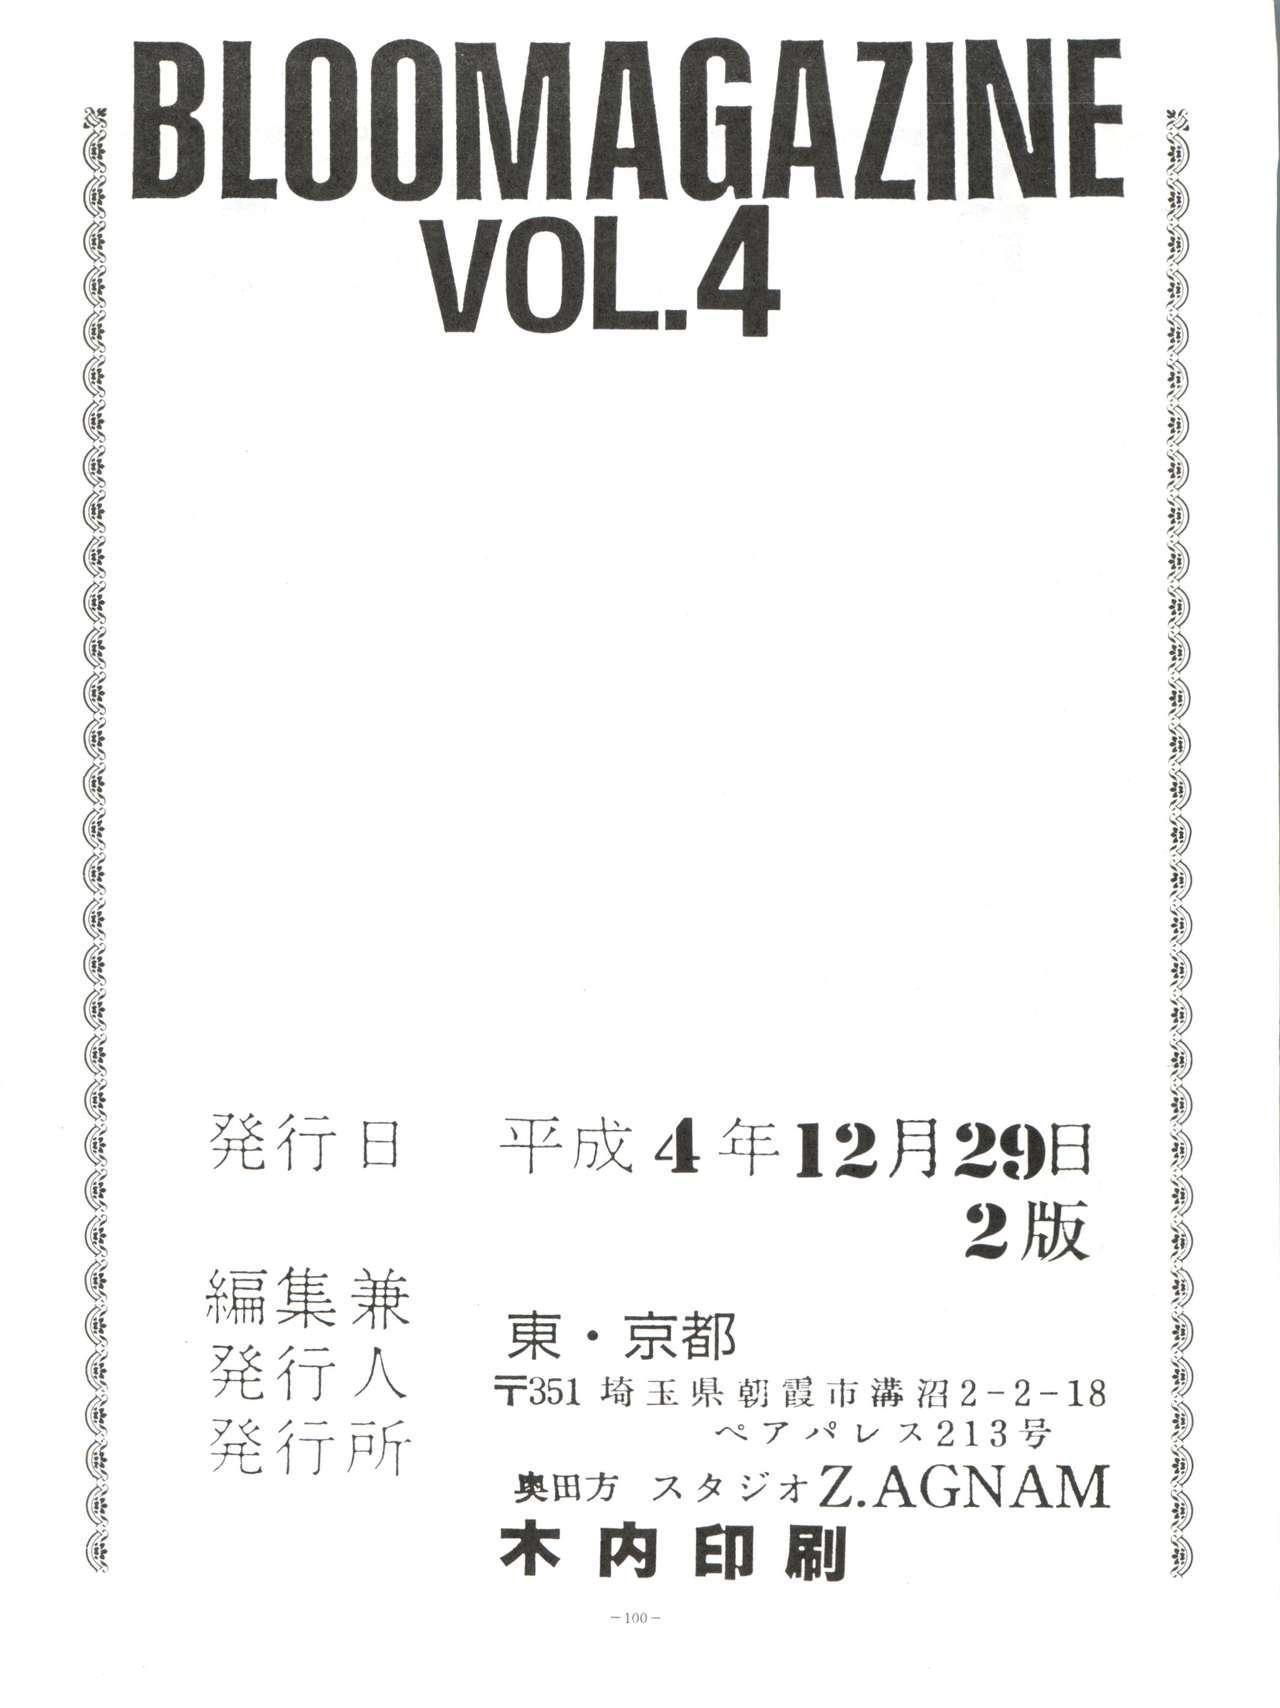 BLOOMAGAZINE Vol. 4 99